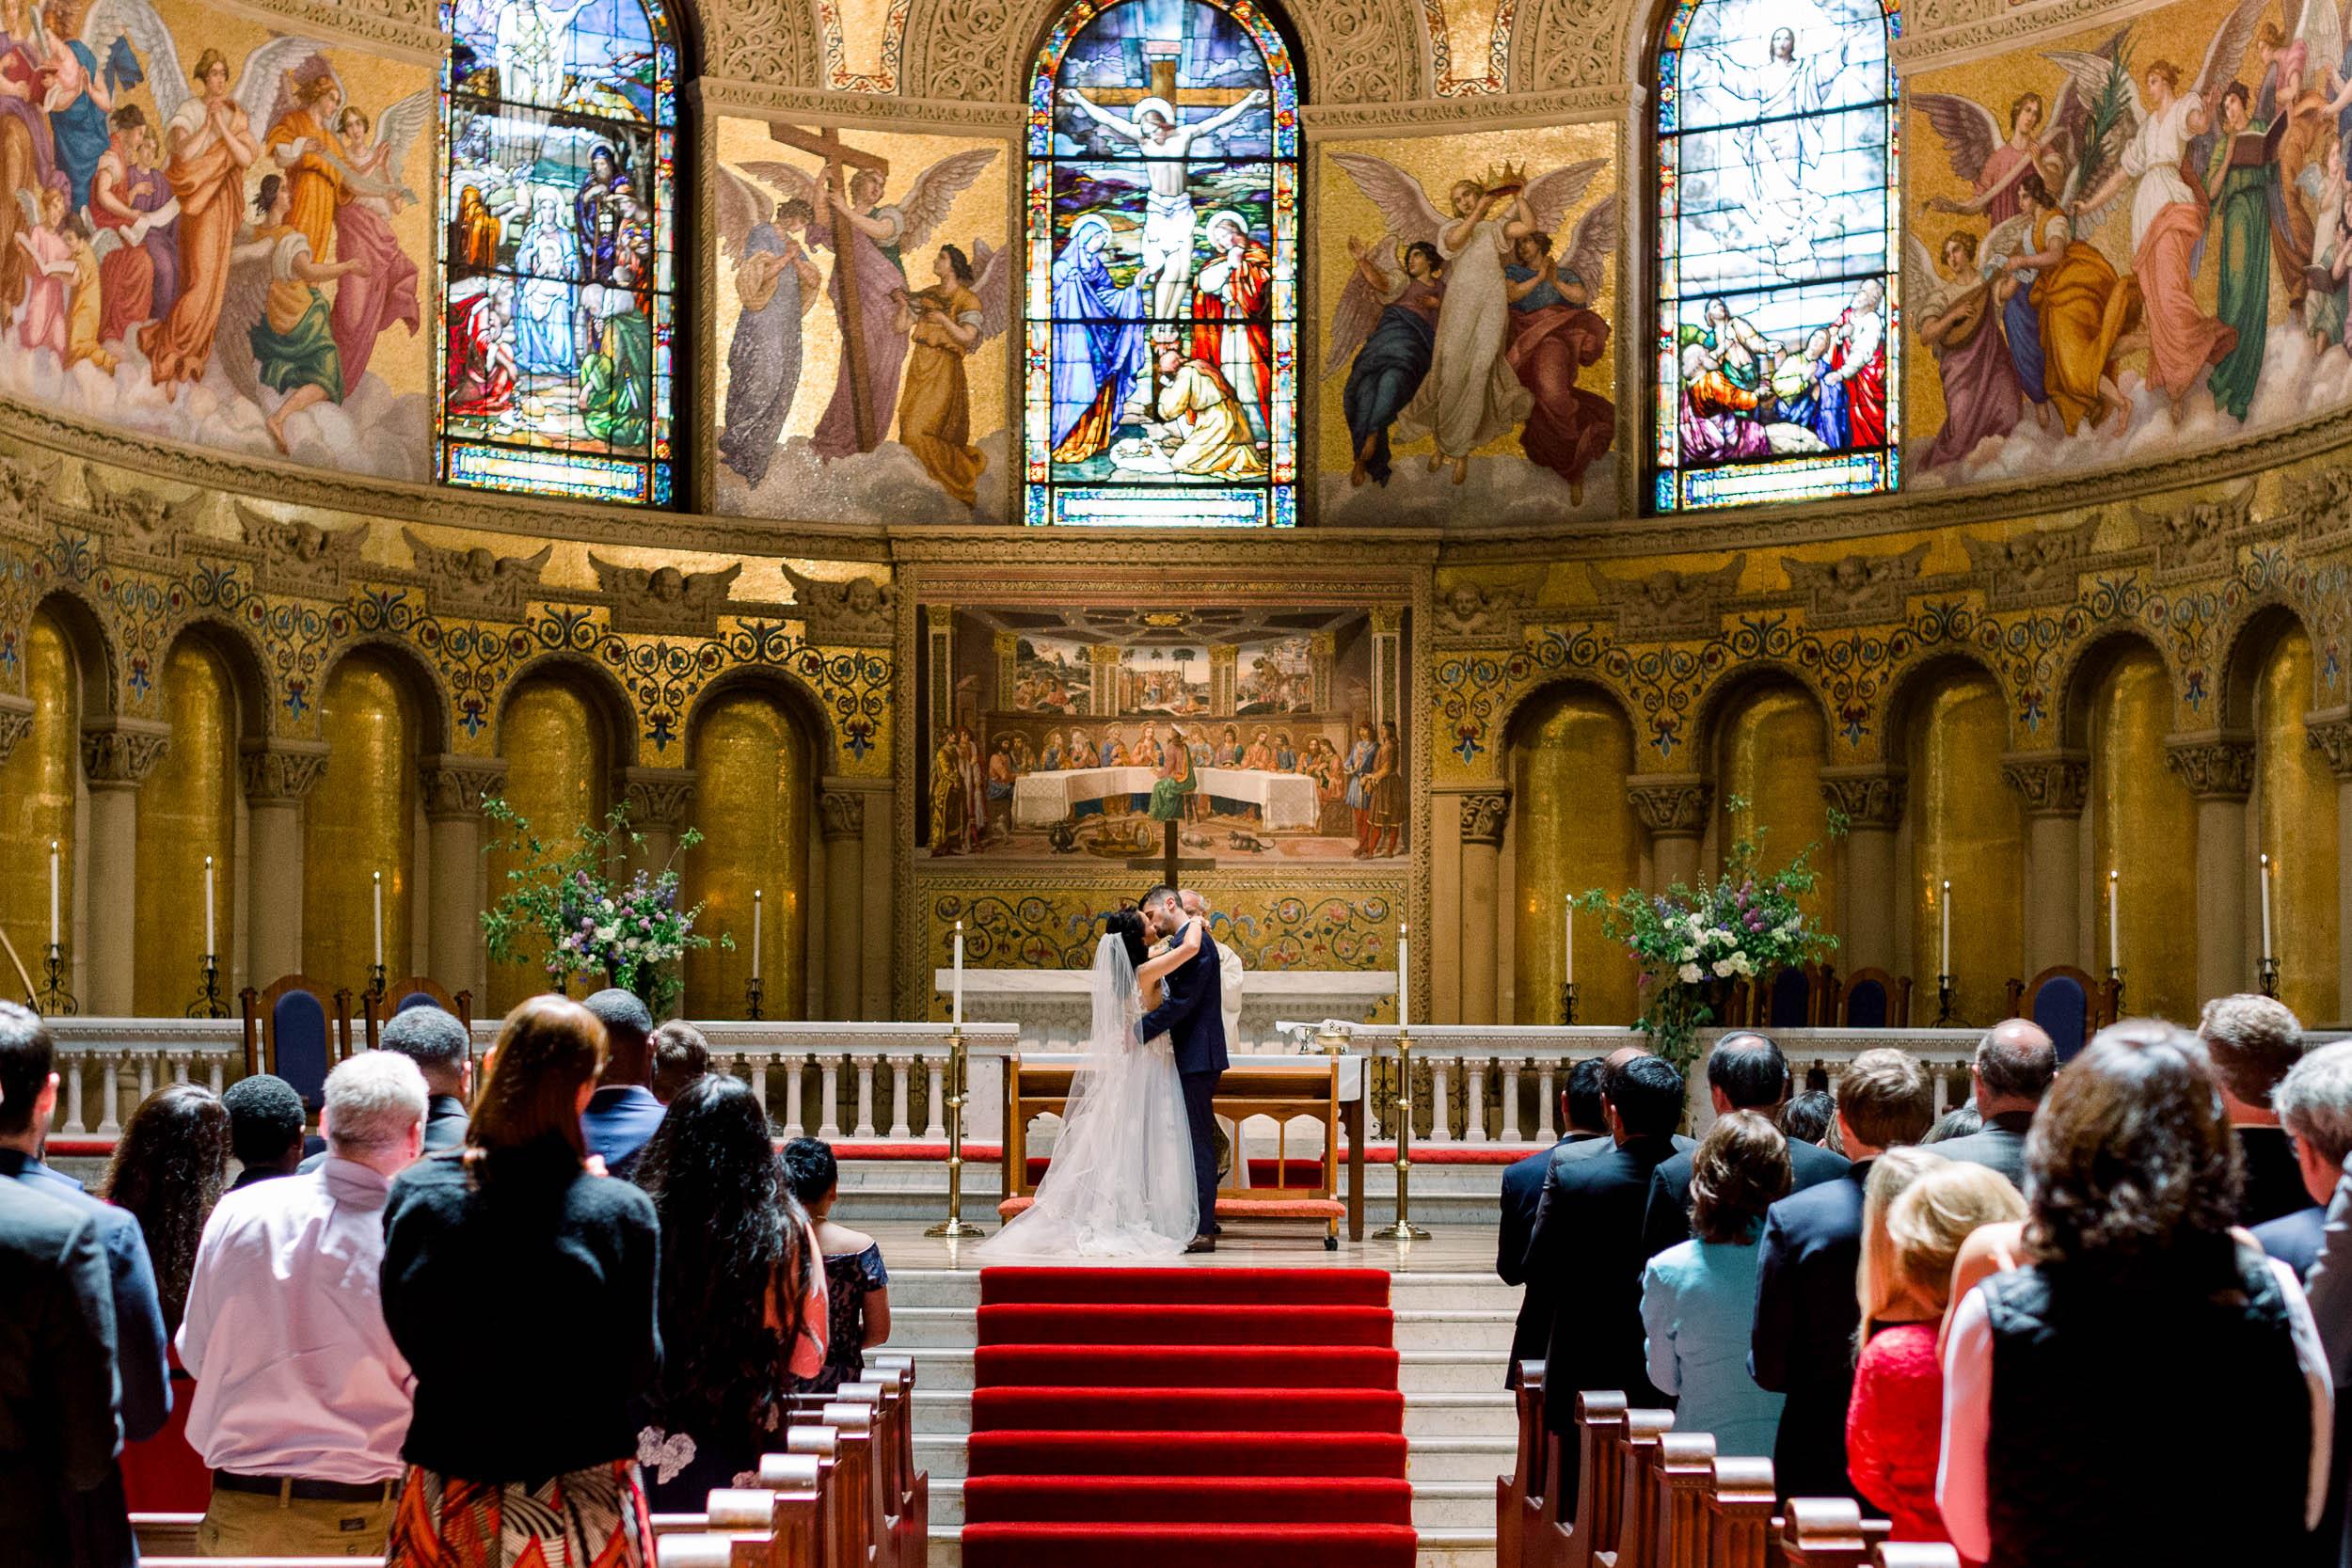 052519_B+S_Hidden Villa Wedding_Buena Lane Photography_052519_0421CY.jpg